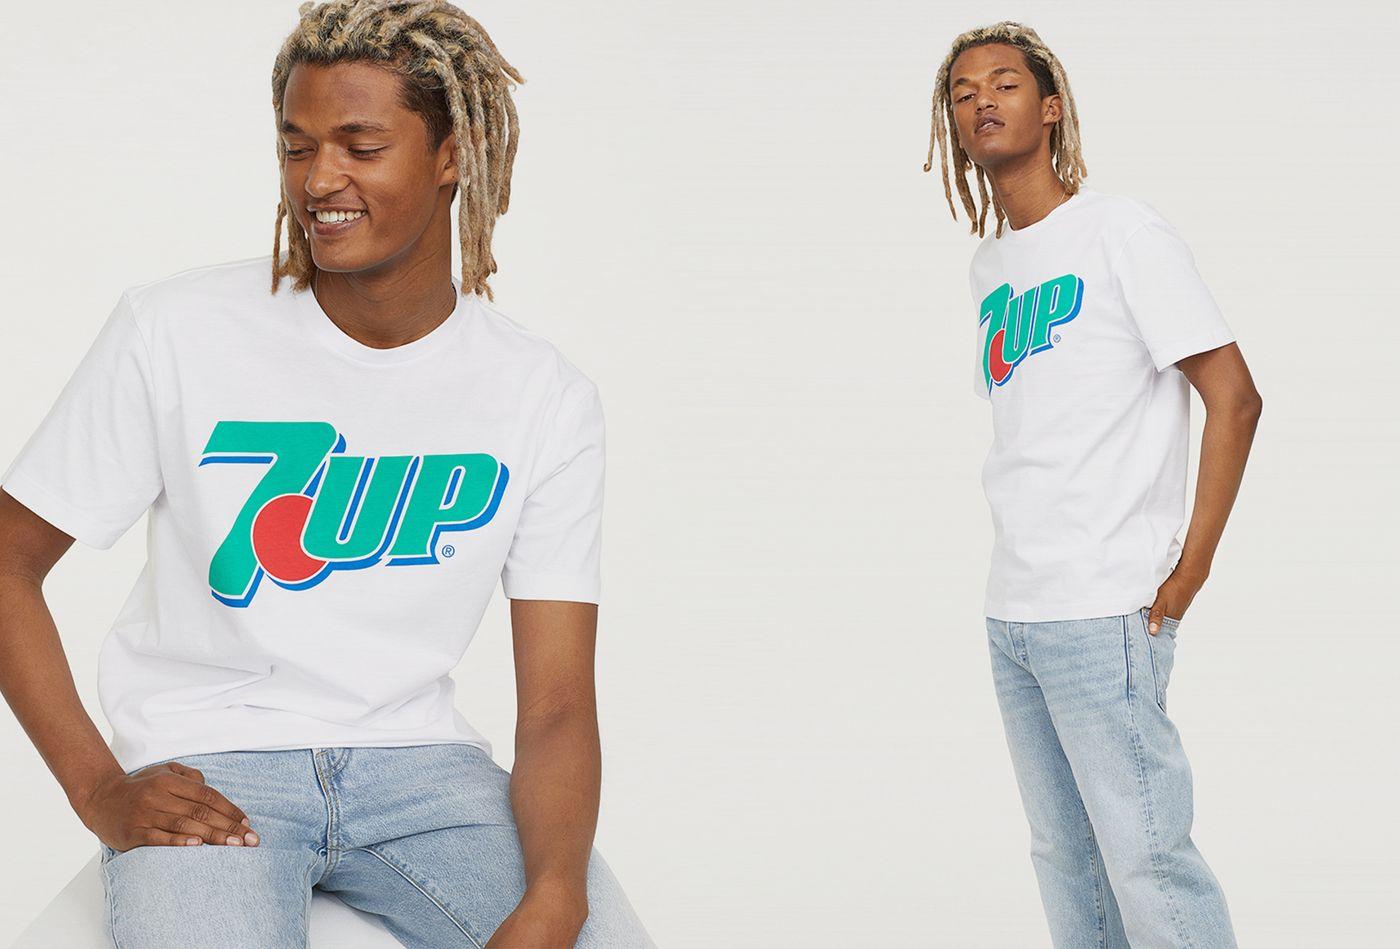 7UP Apparel